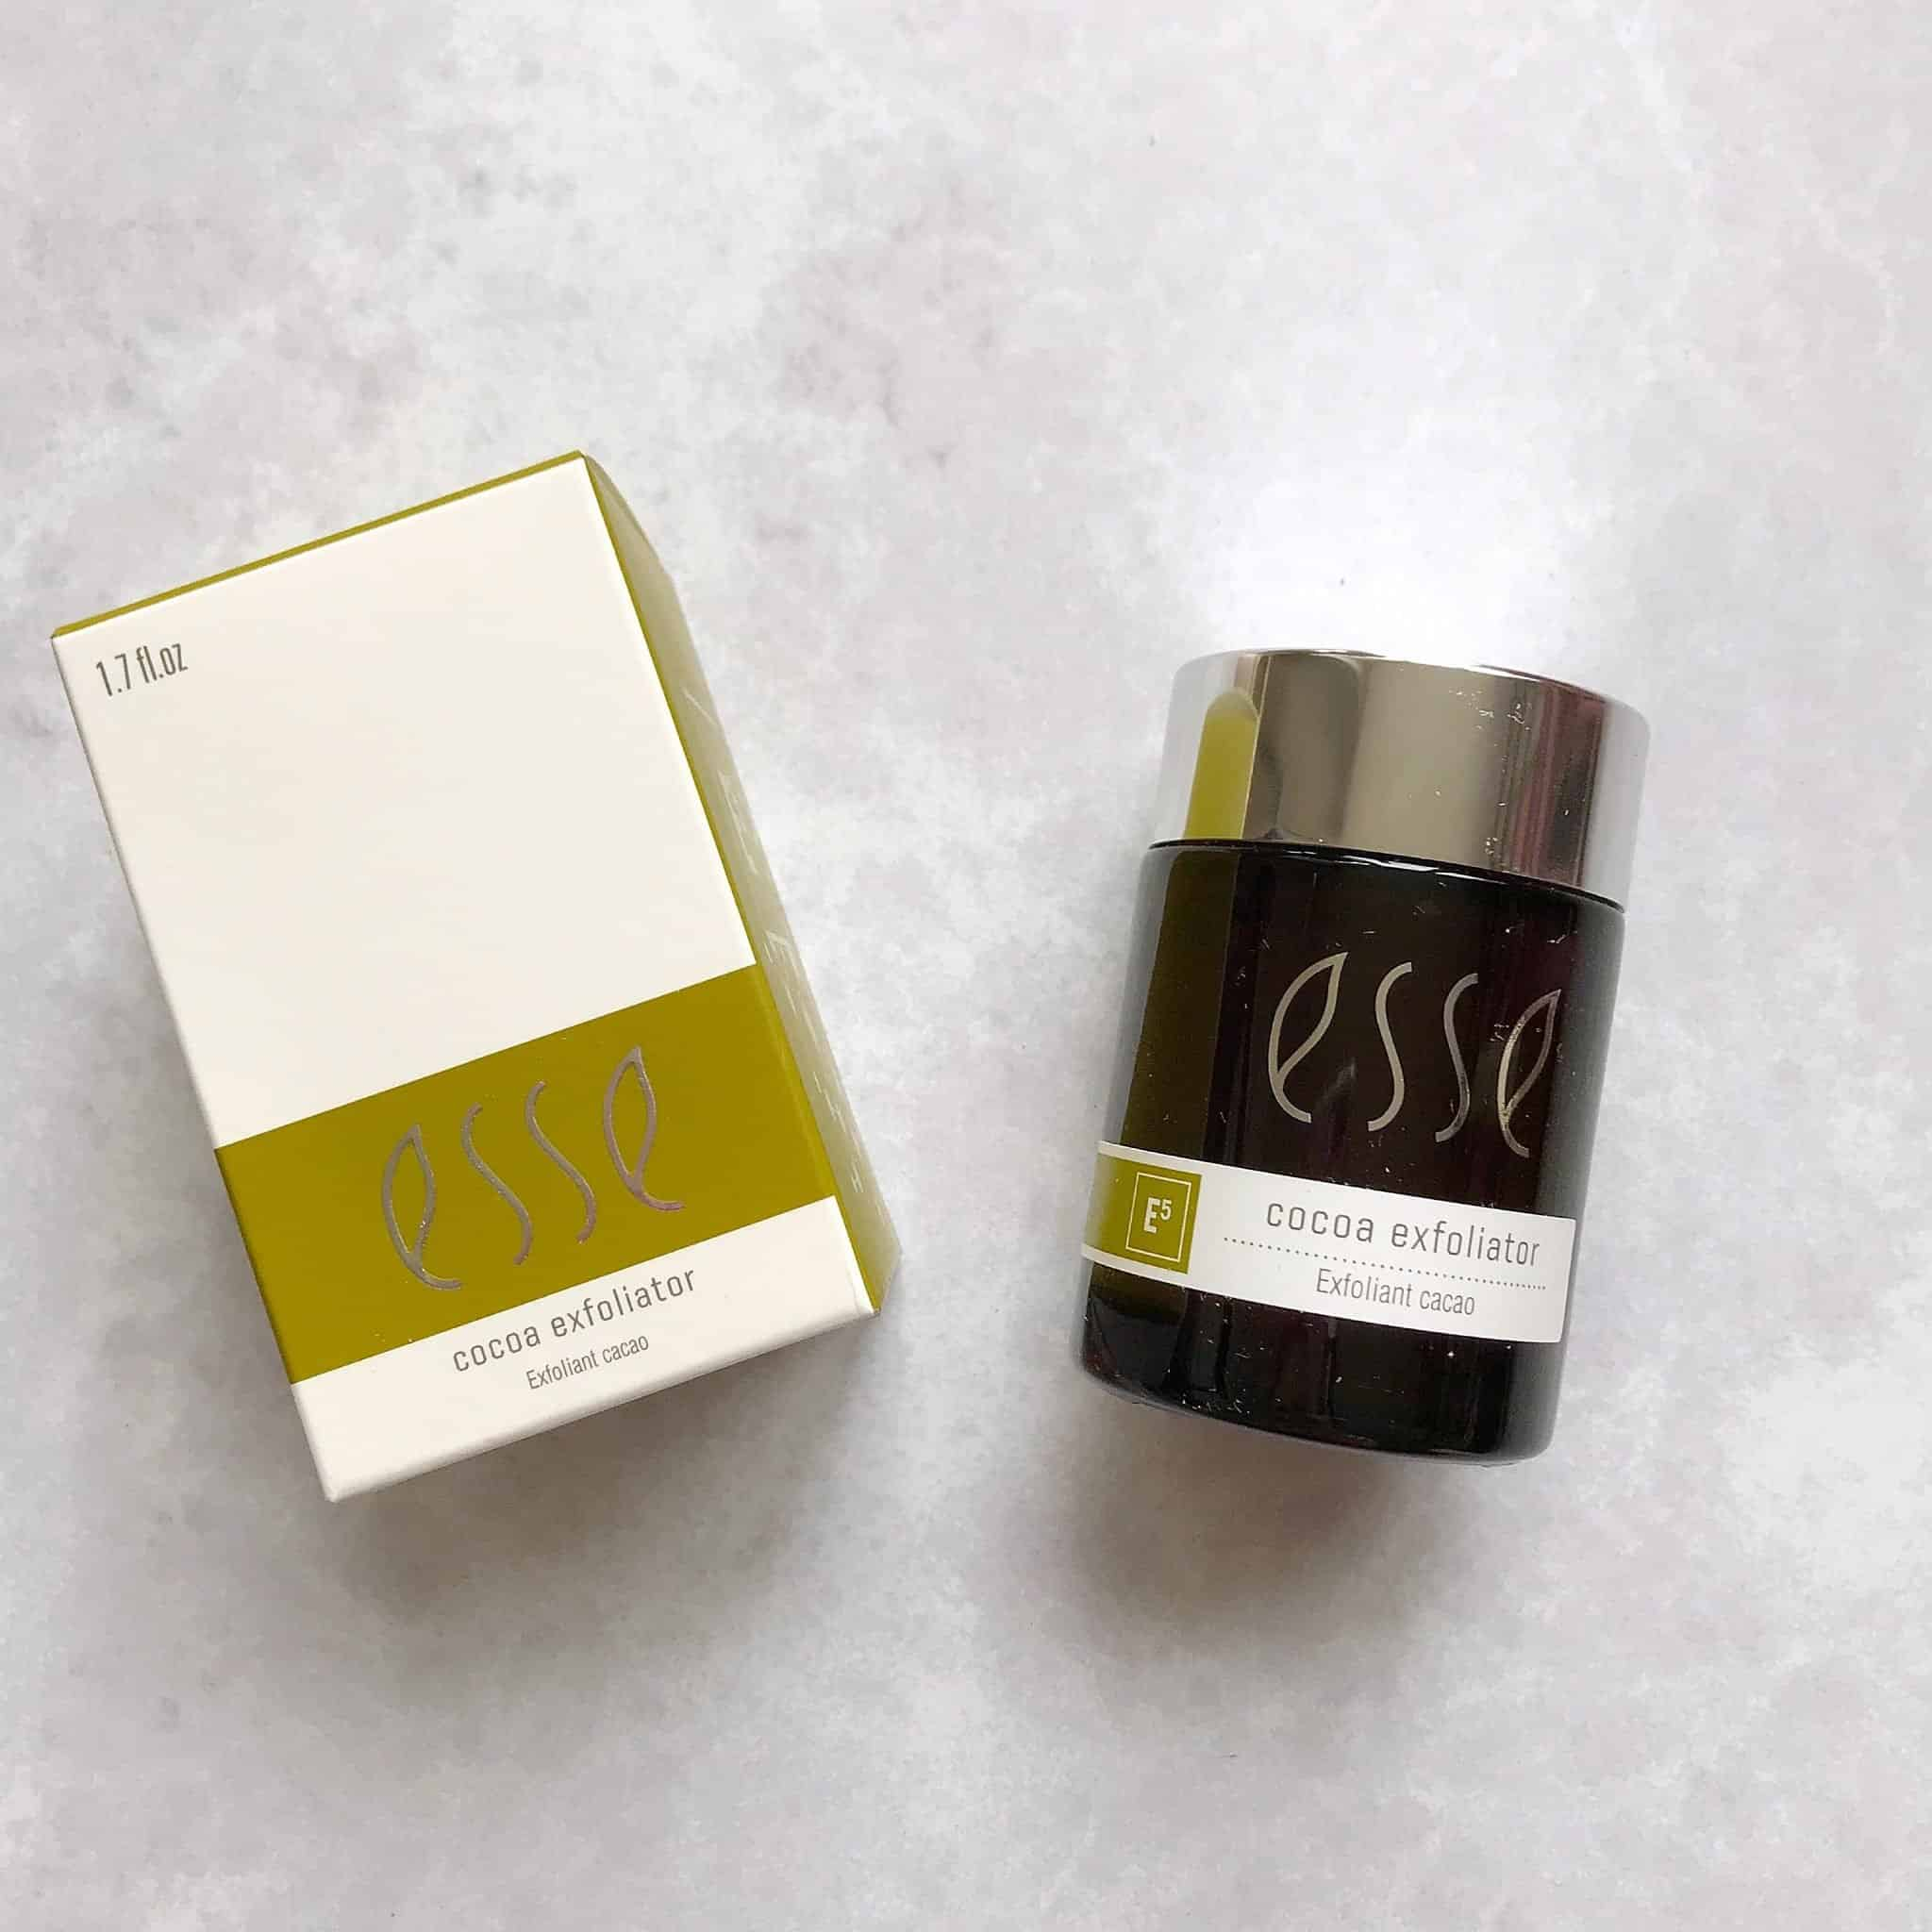 Esse Cocoa Exfoliator Review